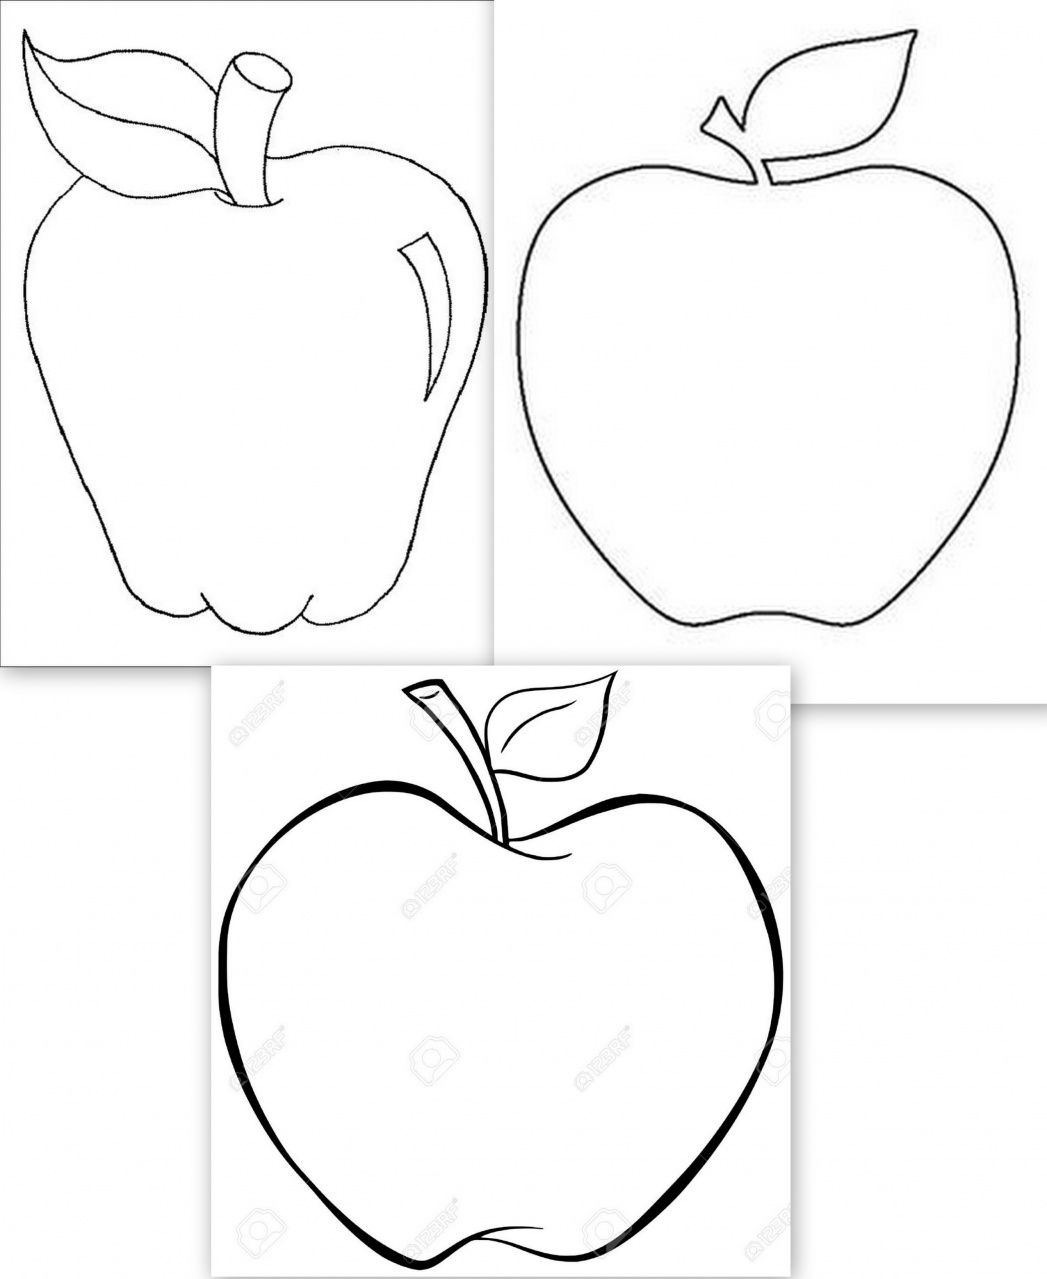 dessins grosses pommes | kreatív | Pinterest | Dibujar y Fruta